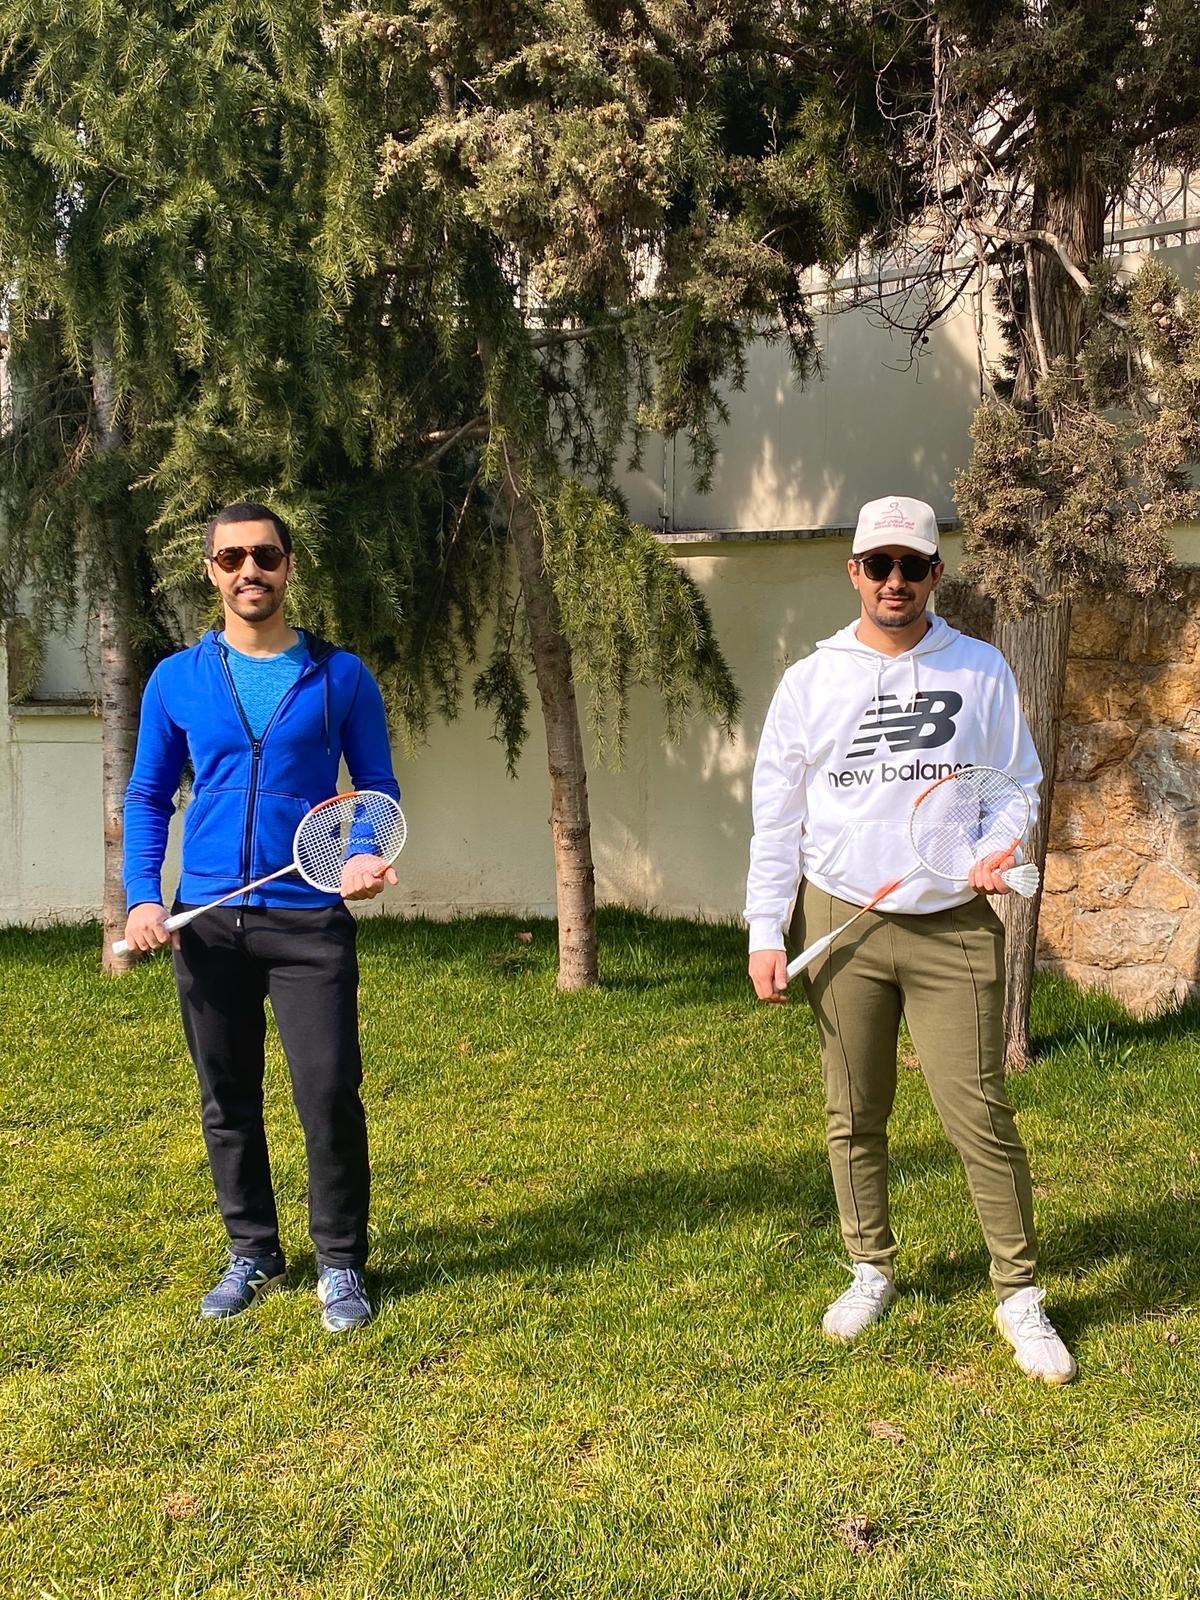 Qatari Embassies, Consulates Abroad Mark National Sports Day